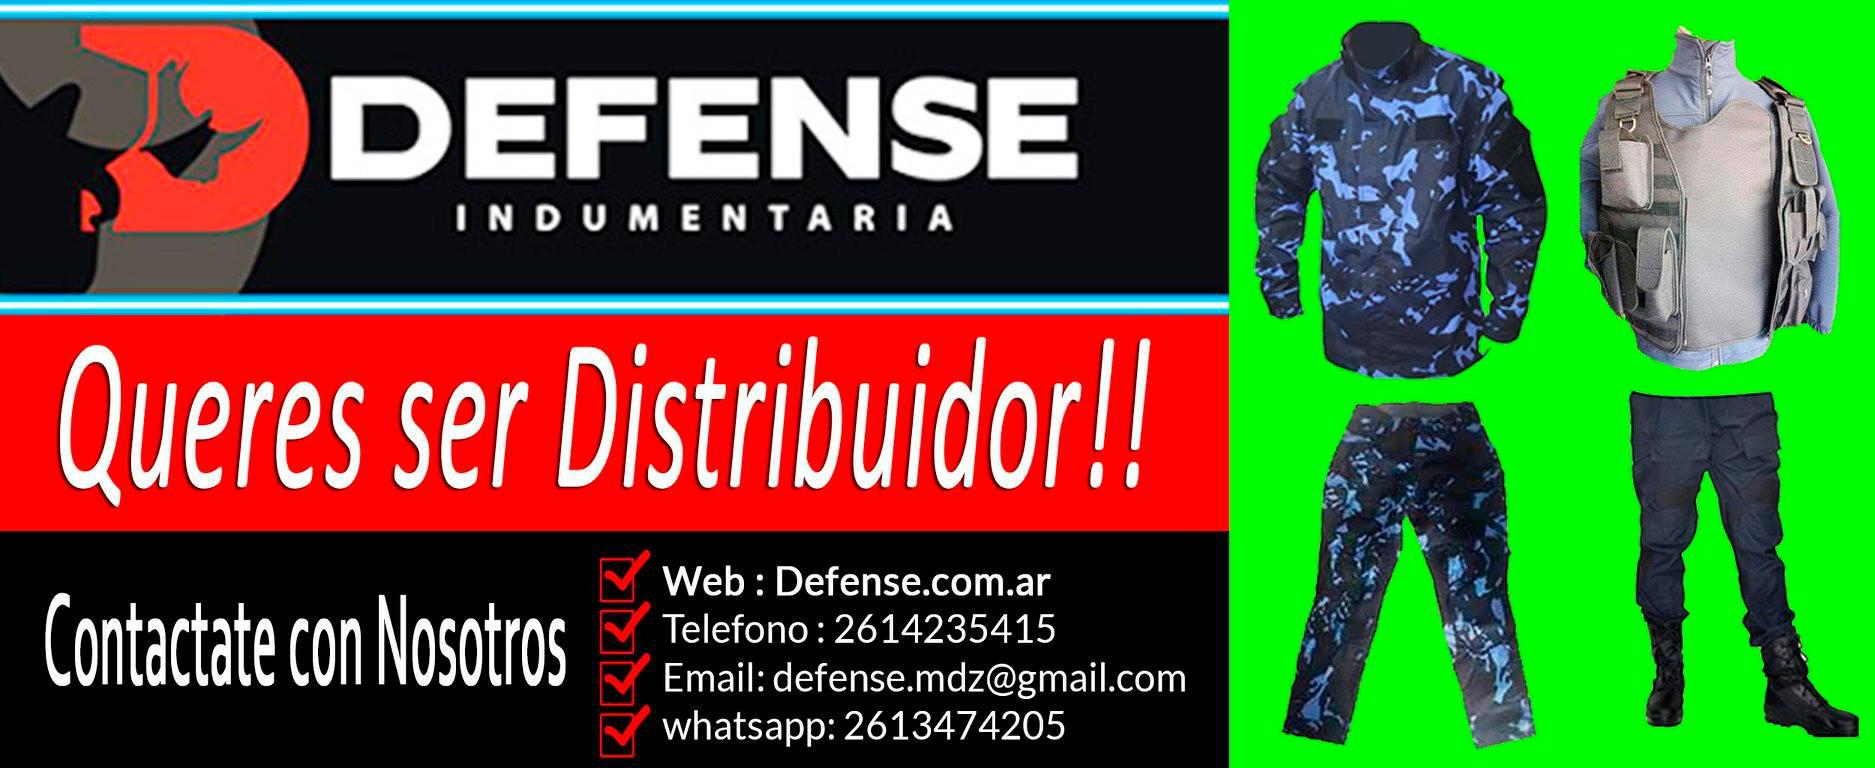 Defense Indumentaria